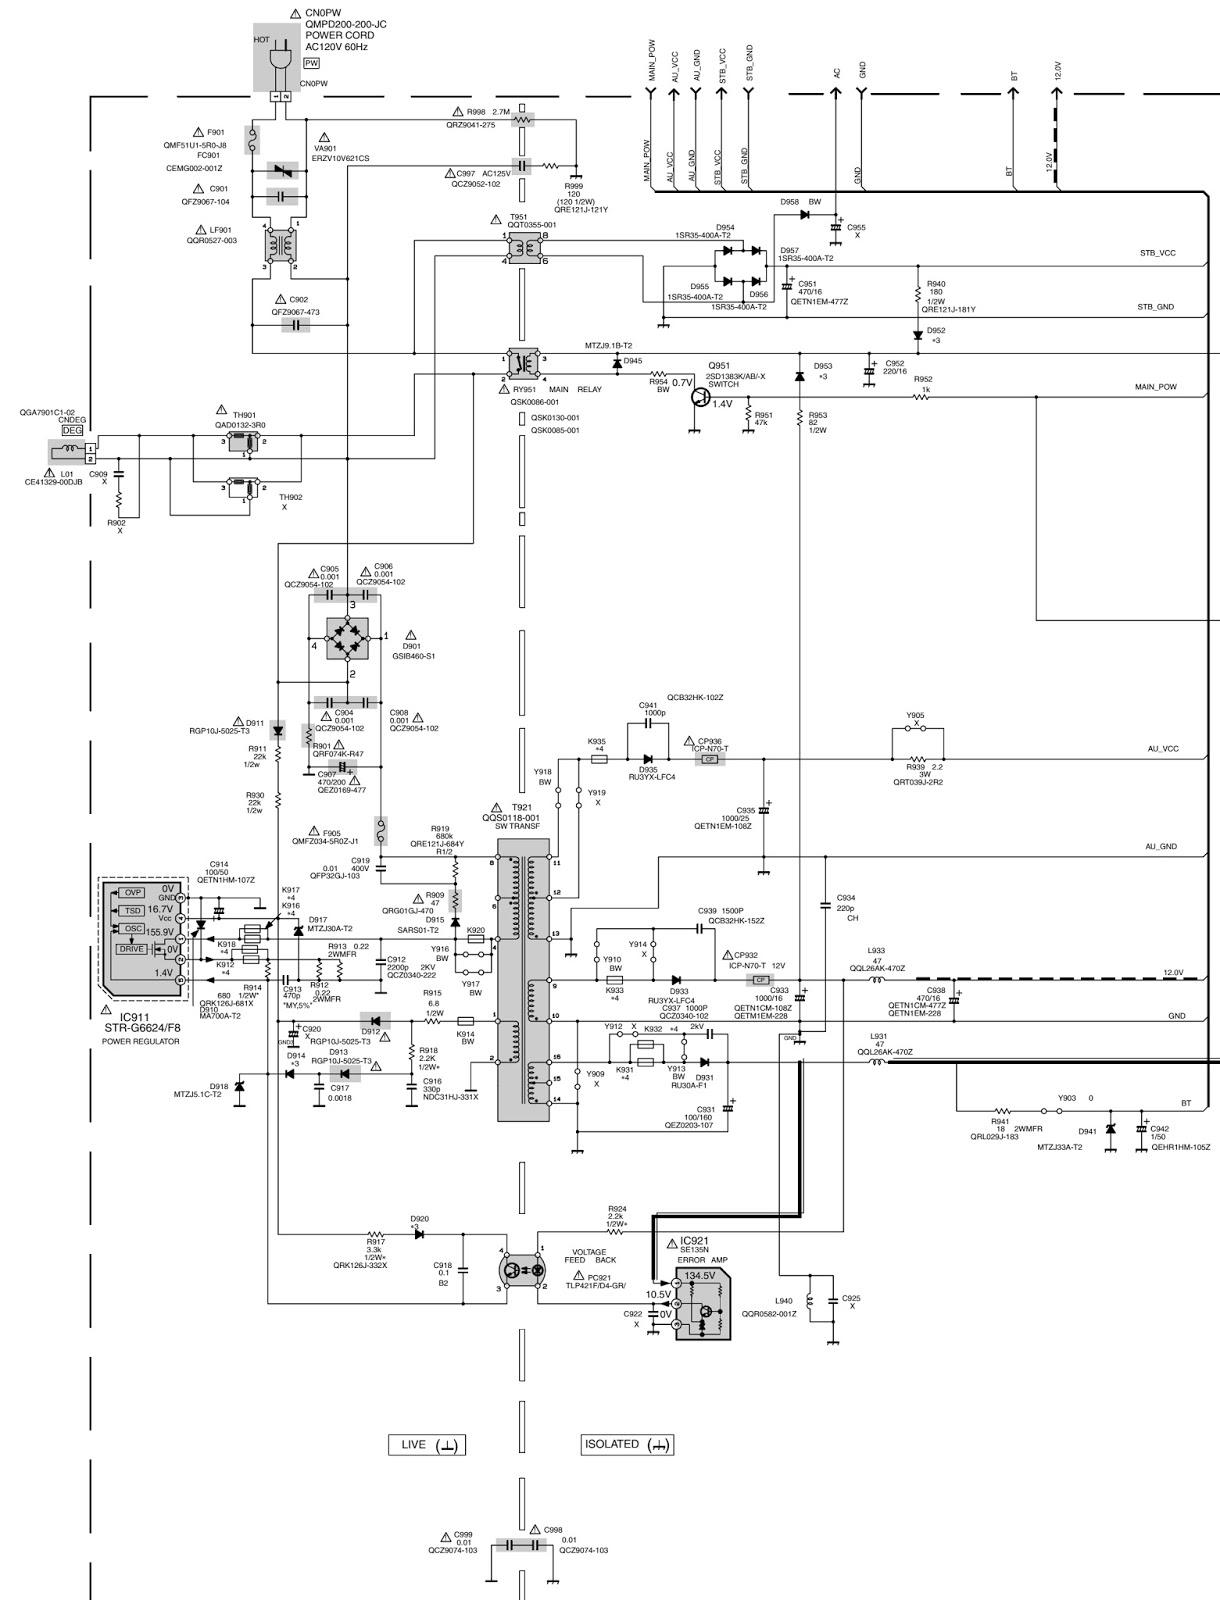 Bodine Ballast Wiring Diagram : 29 Wiring Diagram Images